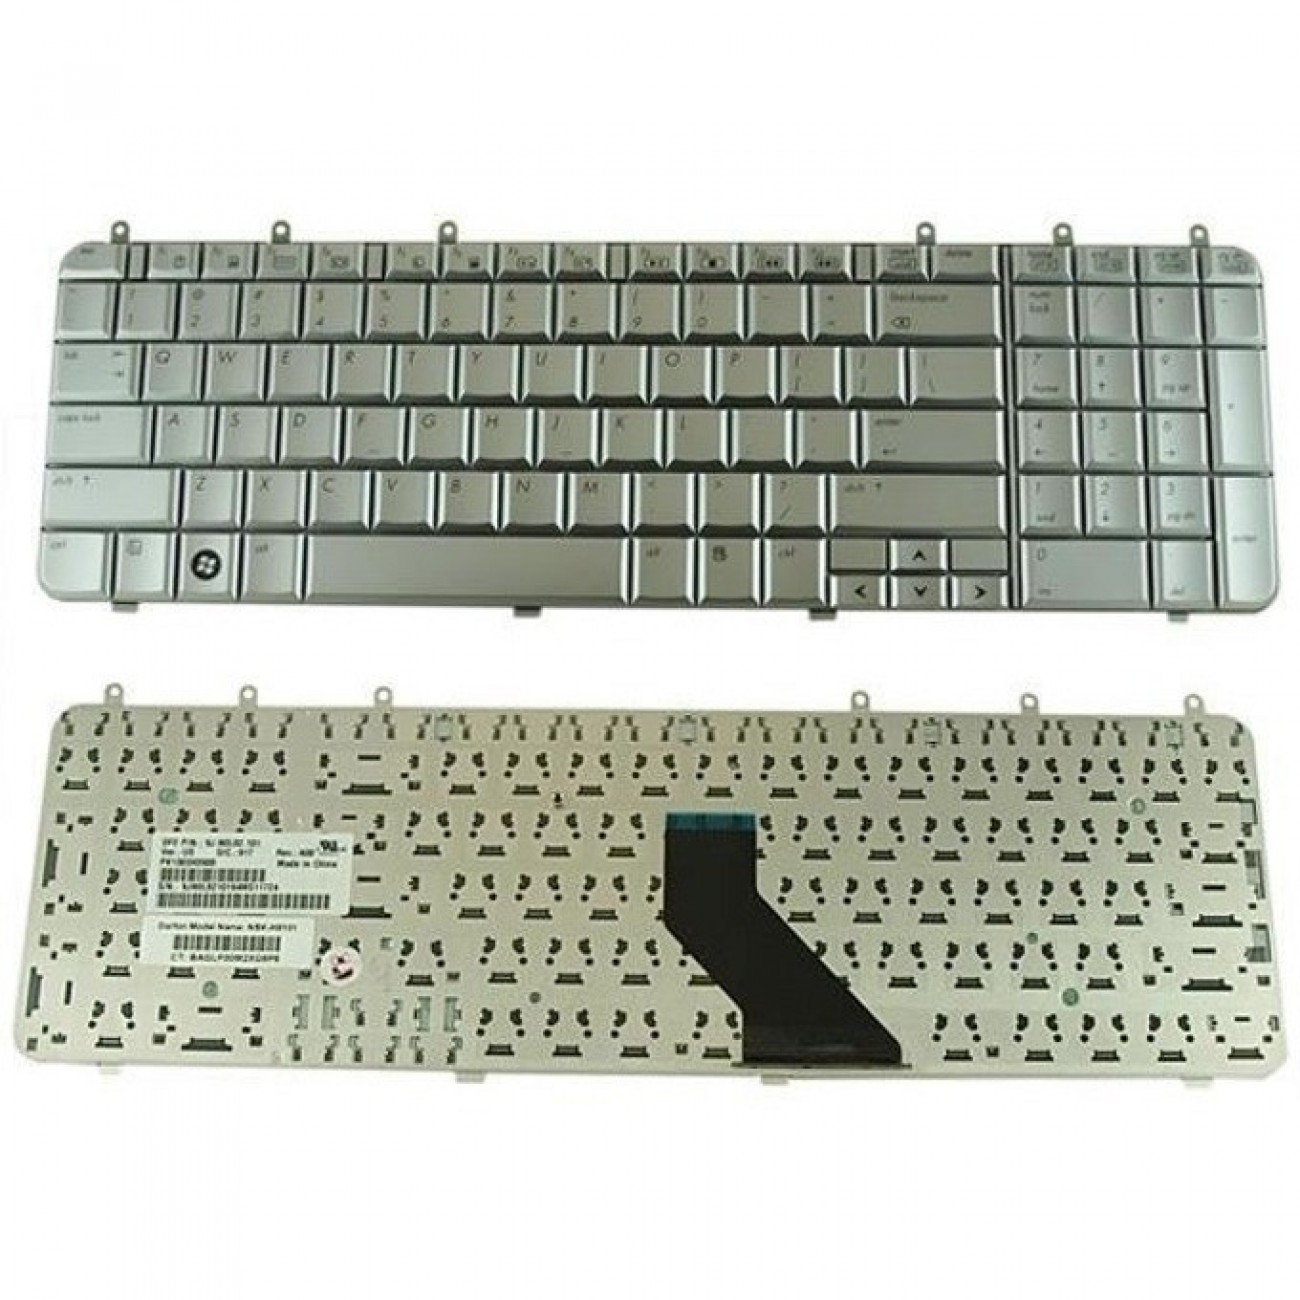 Клавиатура за HP Pavilion DV7 DV7-1000, UK, сребриста в Резервни части -    Alleop